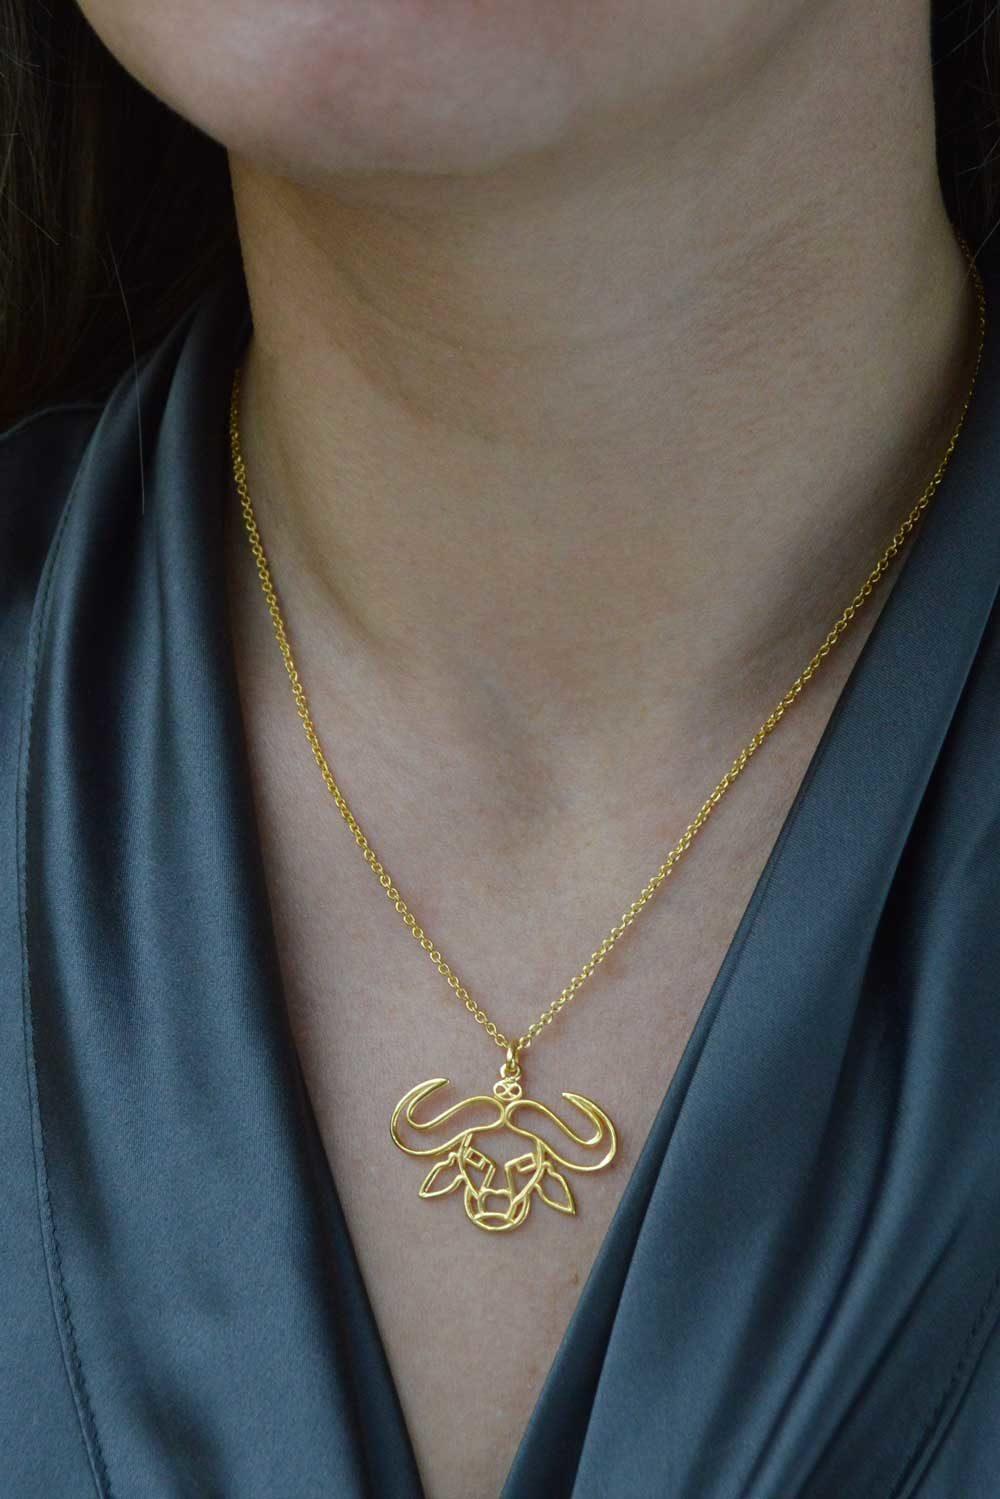 Buffalo Gold Plated Necklace Formal Wear by SHIKHAZURI